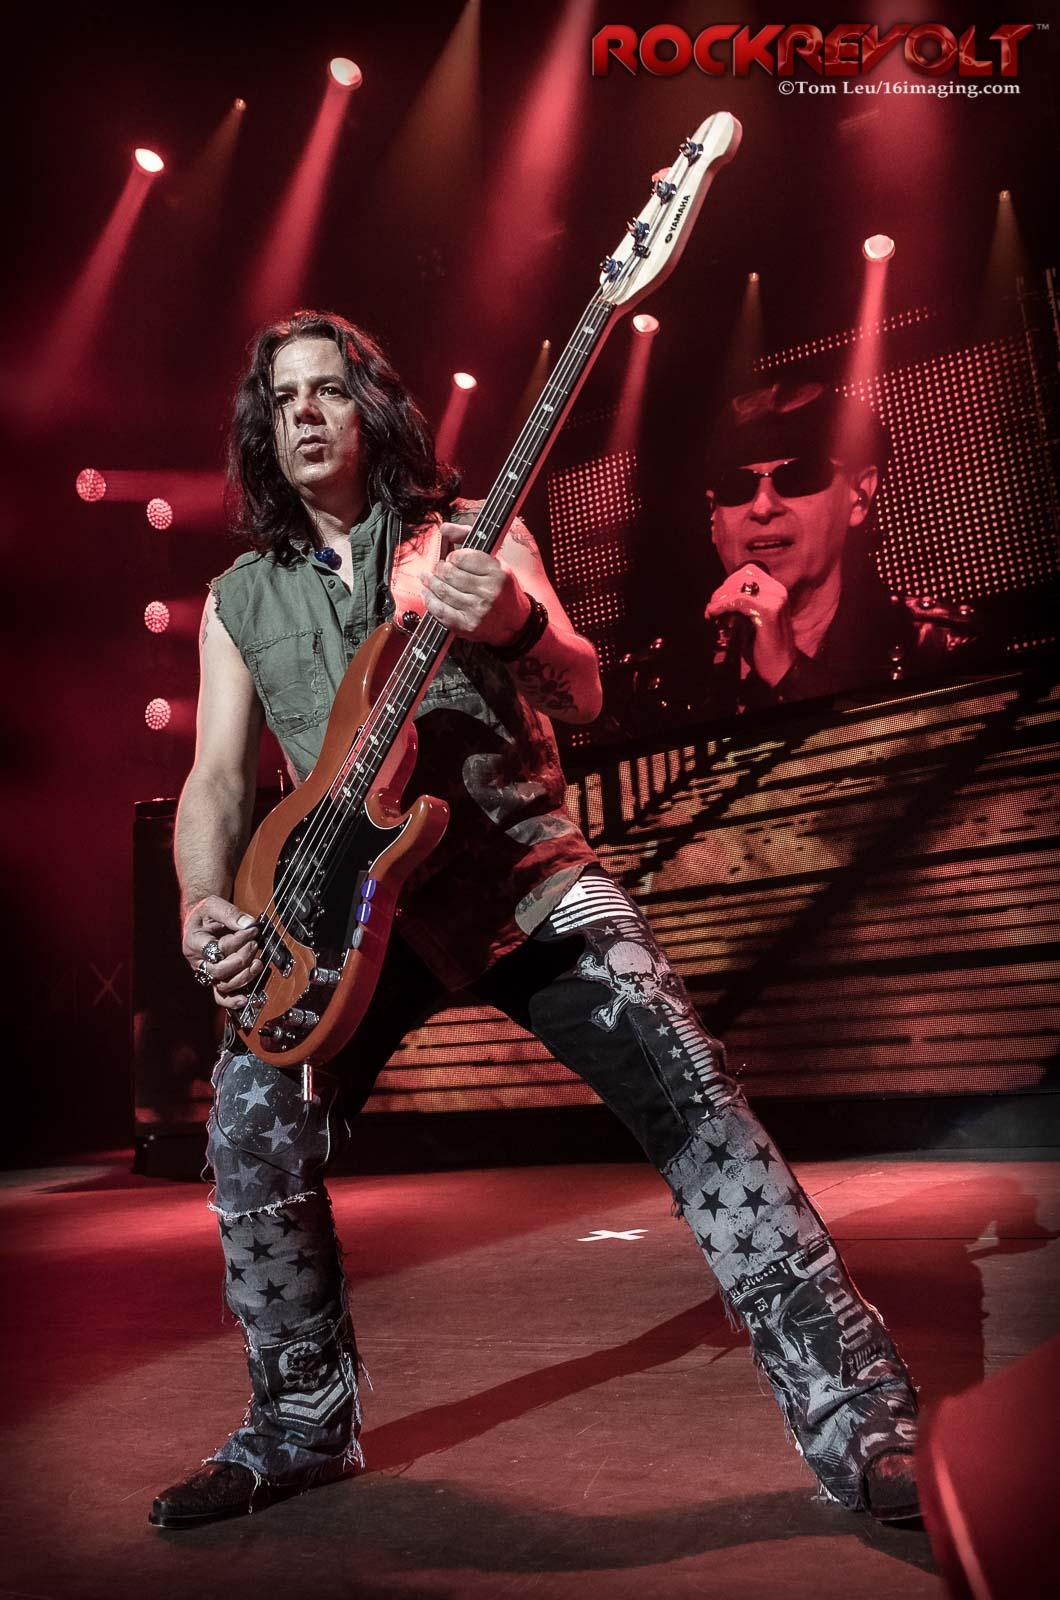 2016_Scorpions_RockRevolt10